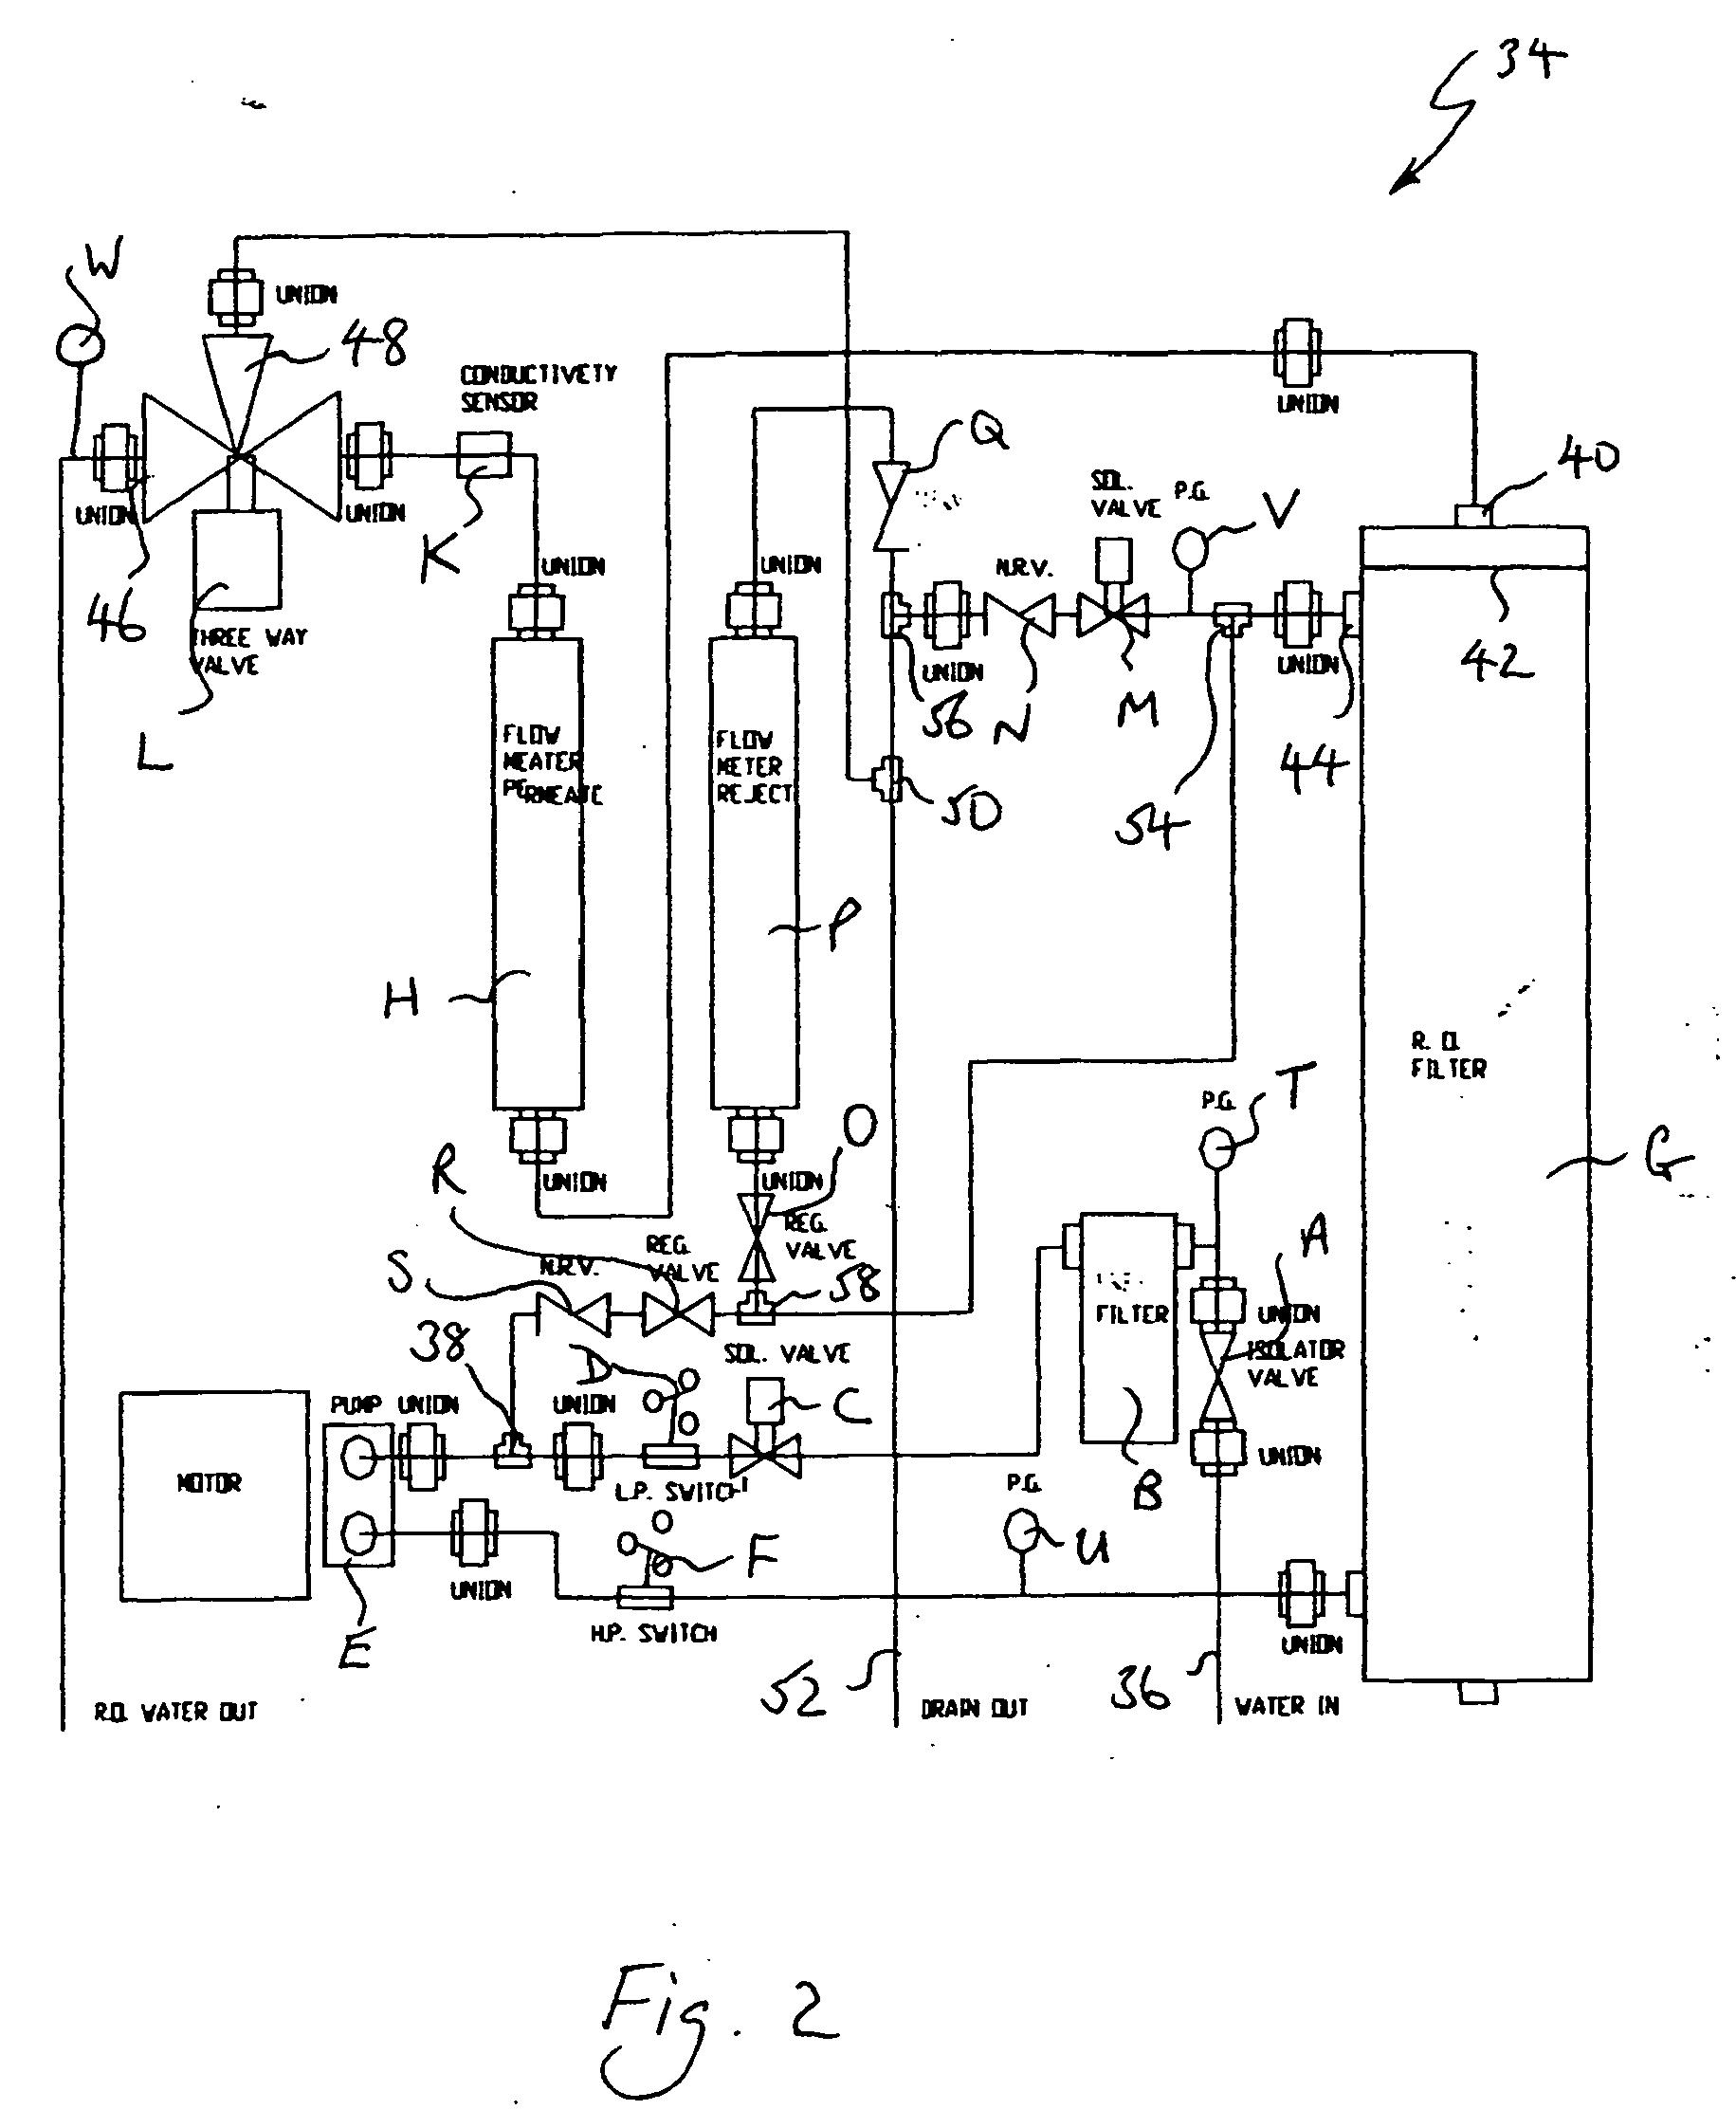 Reverse Osmosis Water Filter Diagram